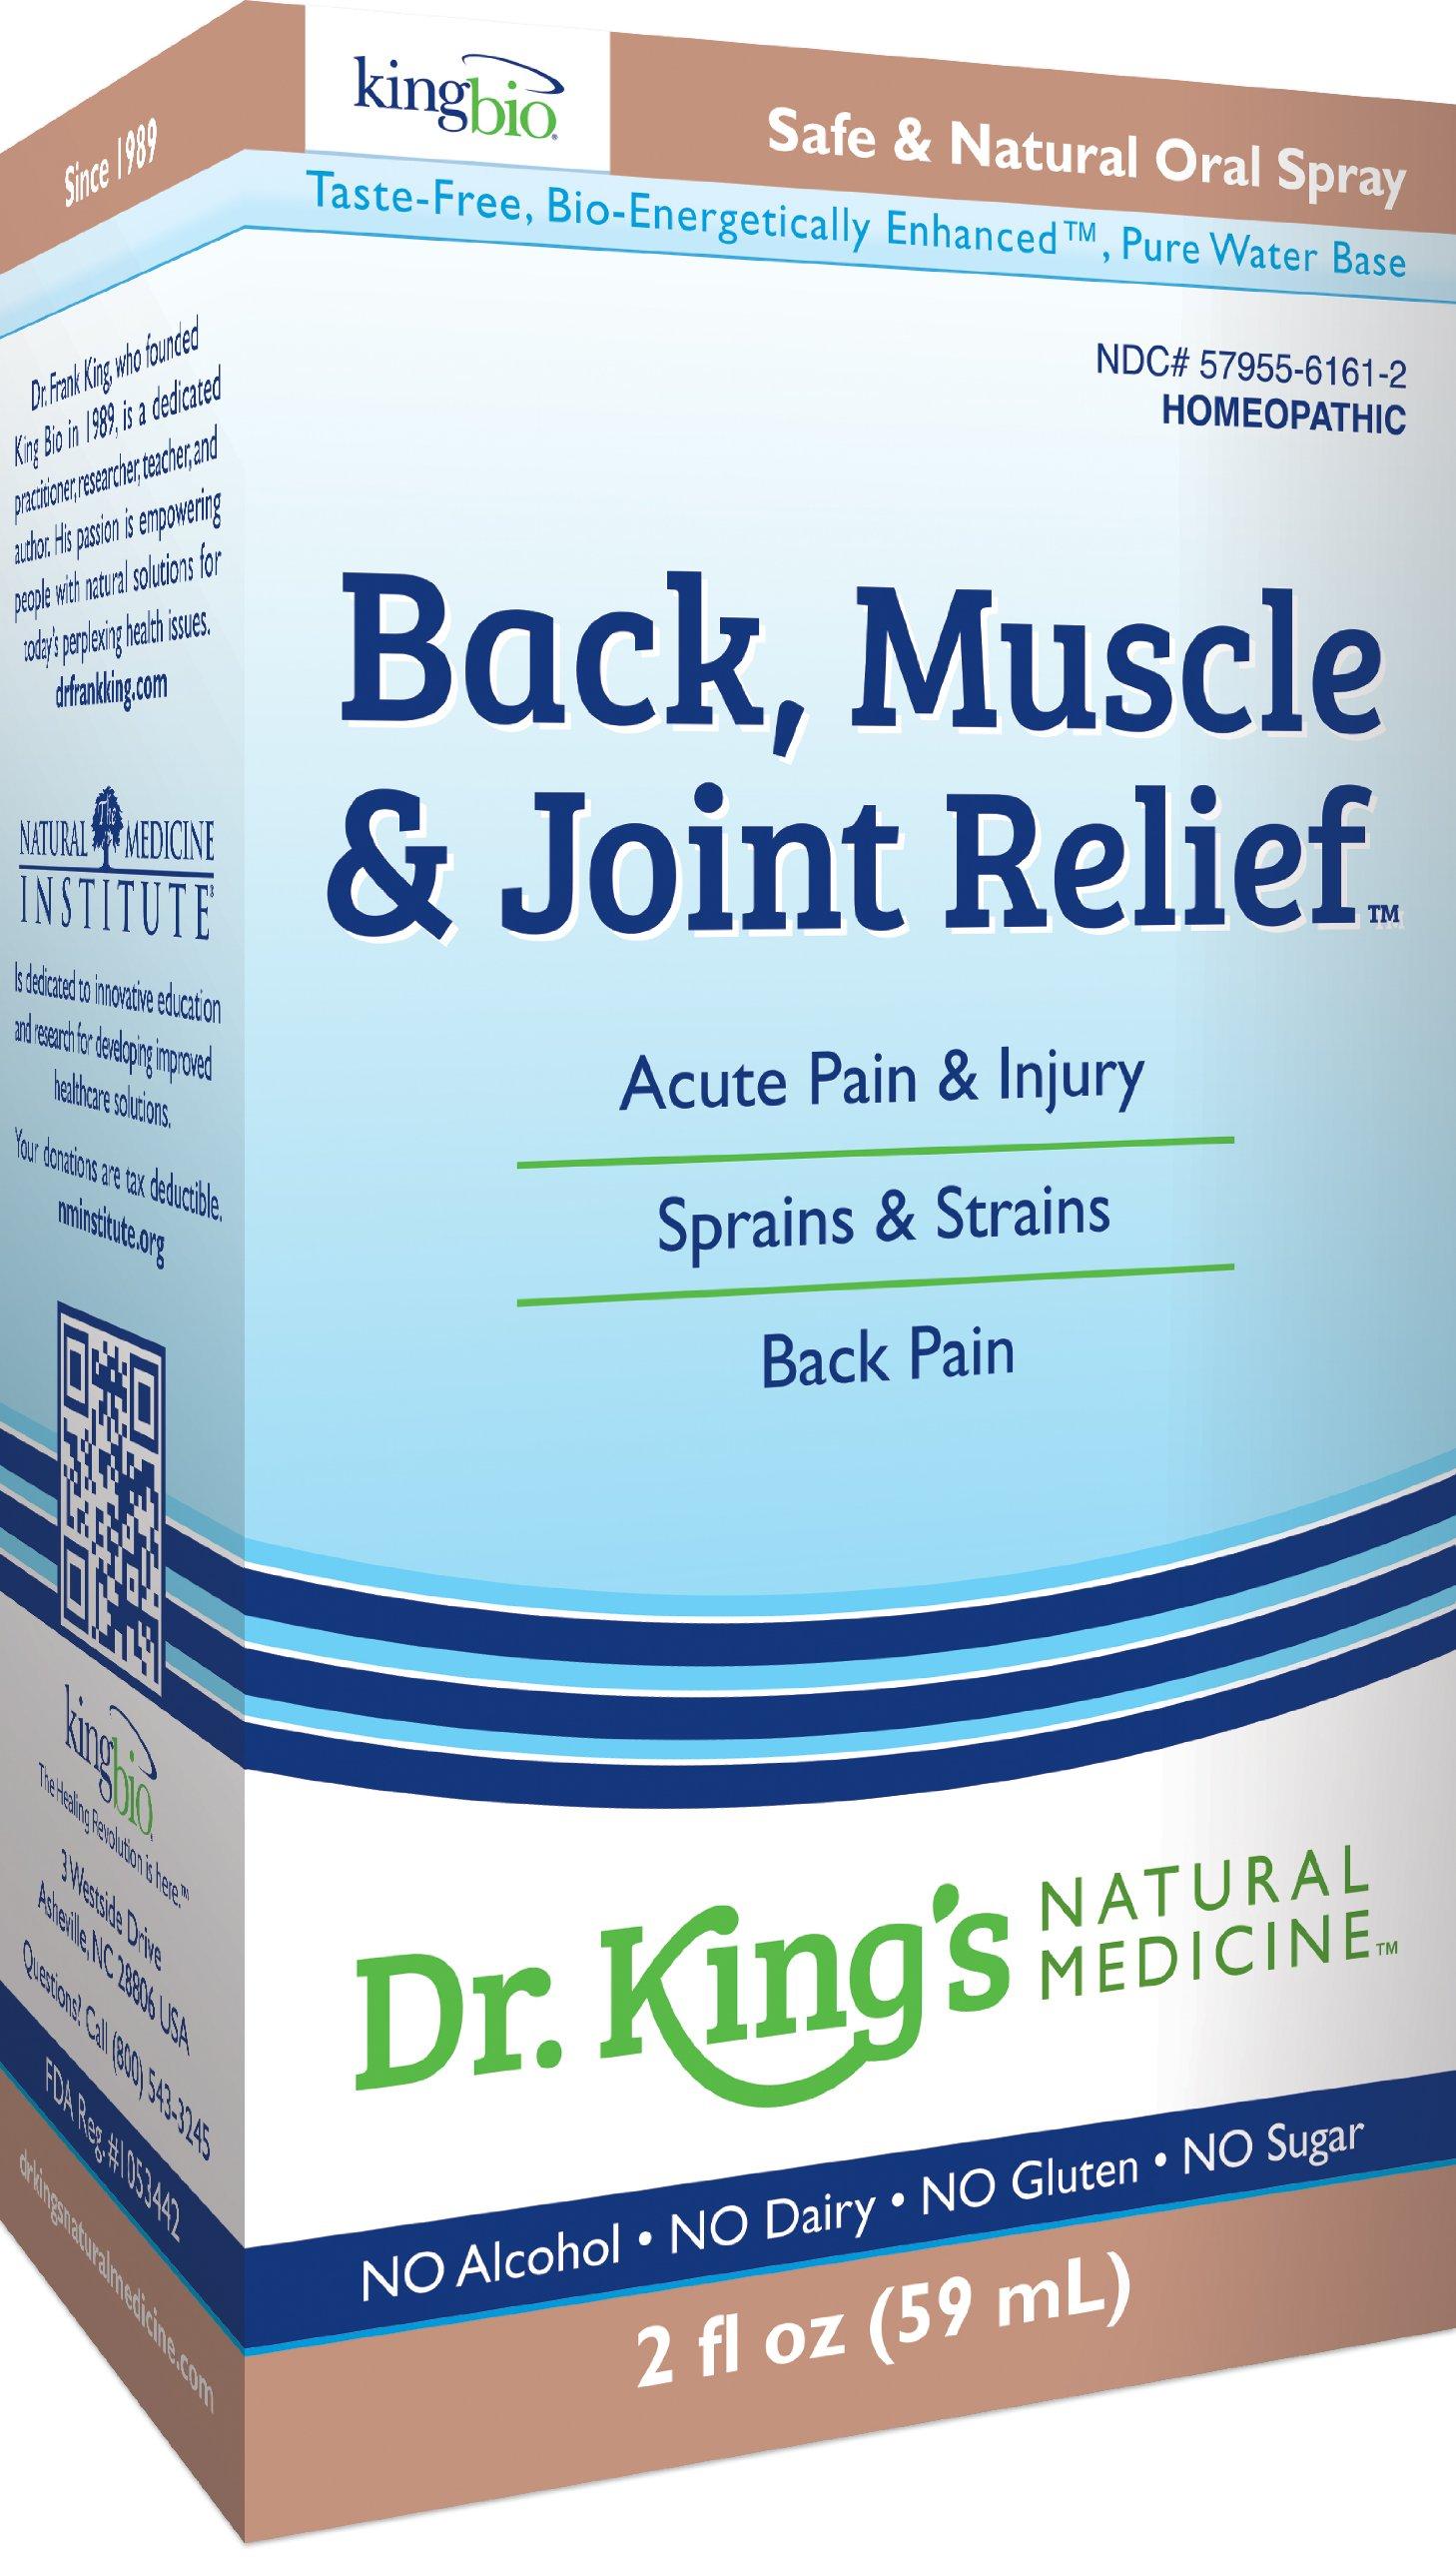 Amazon.com: Dr. King\'s Natural Medicine Headache Relief, 2 Fluid ...